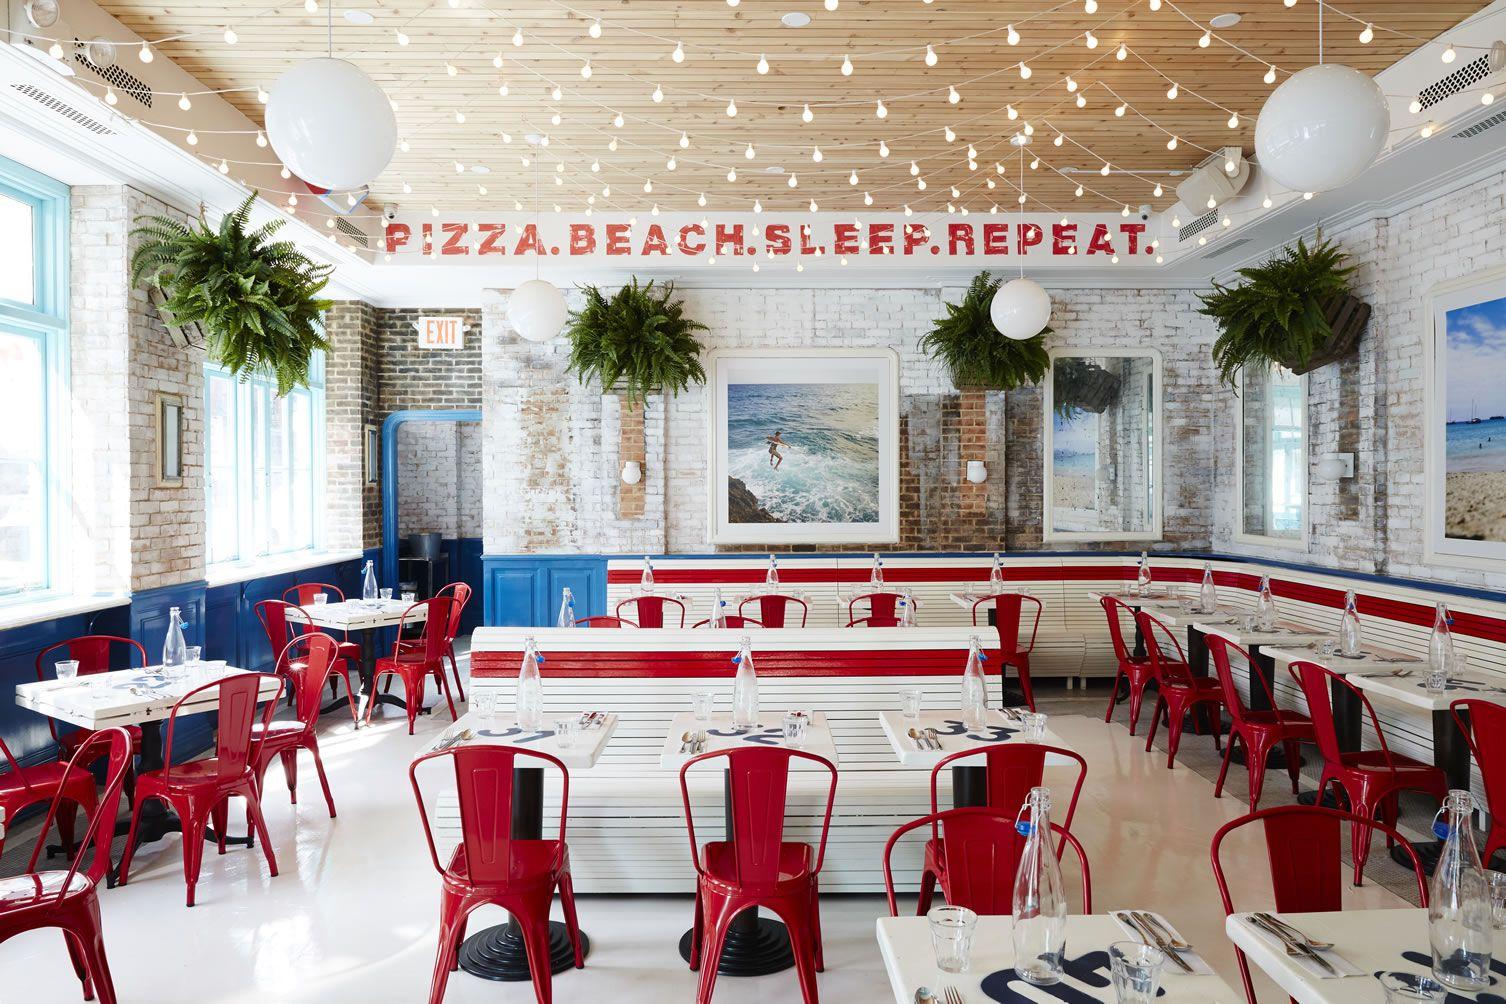 Pizza Beach Lower East Side New York